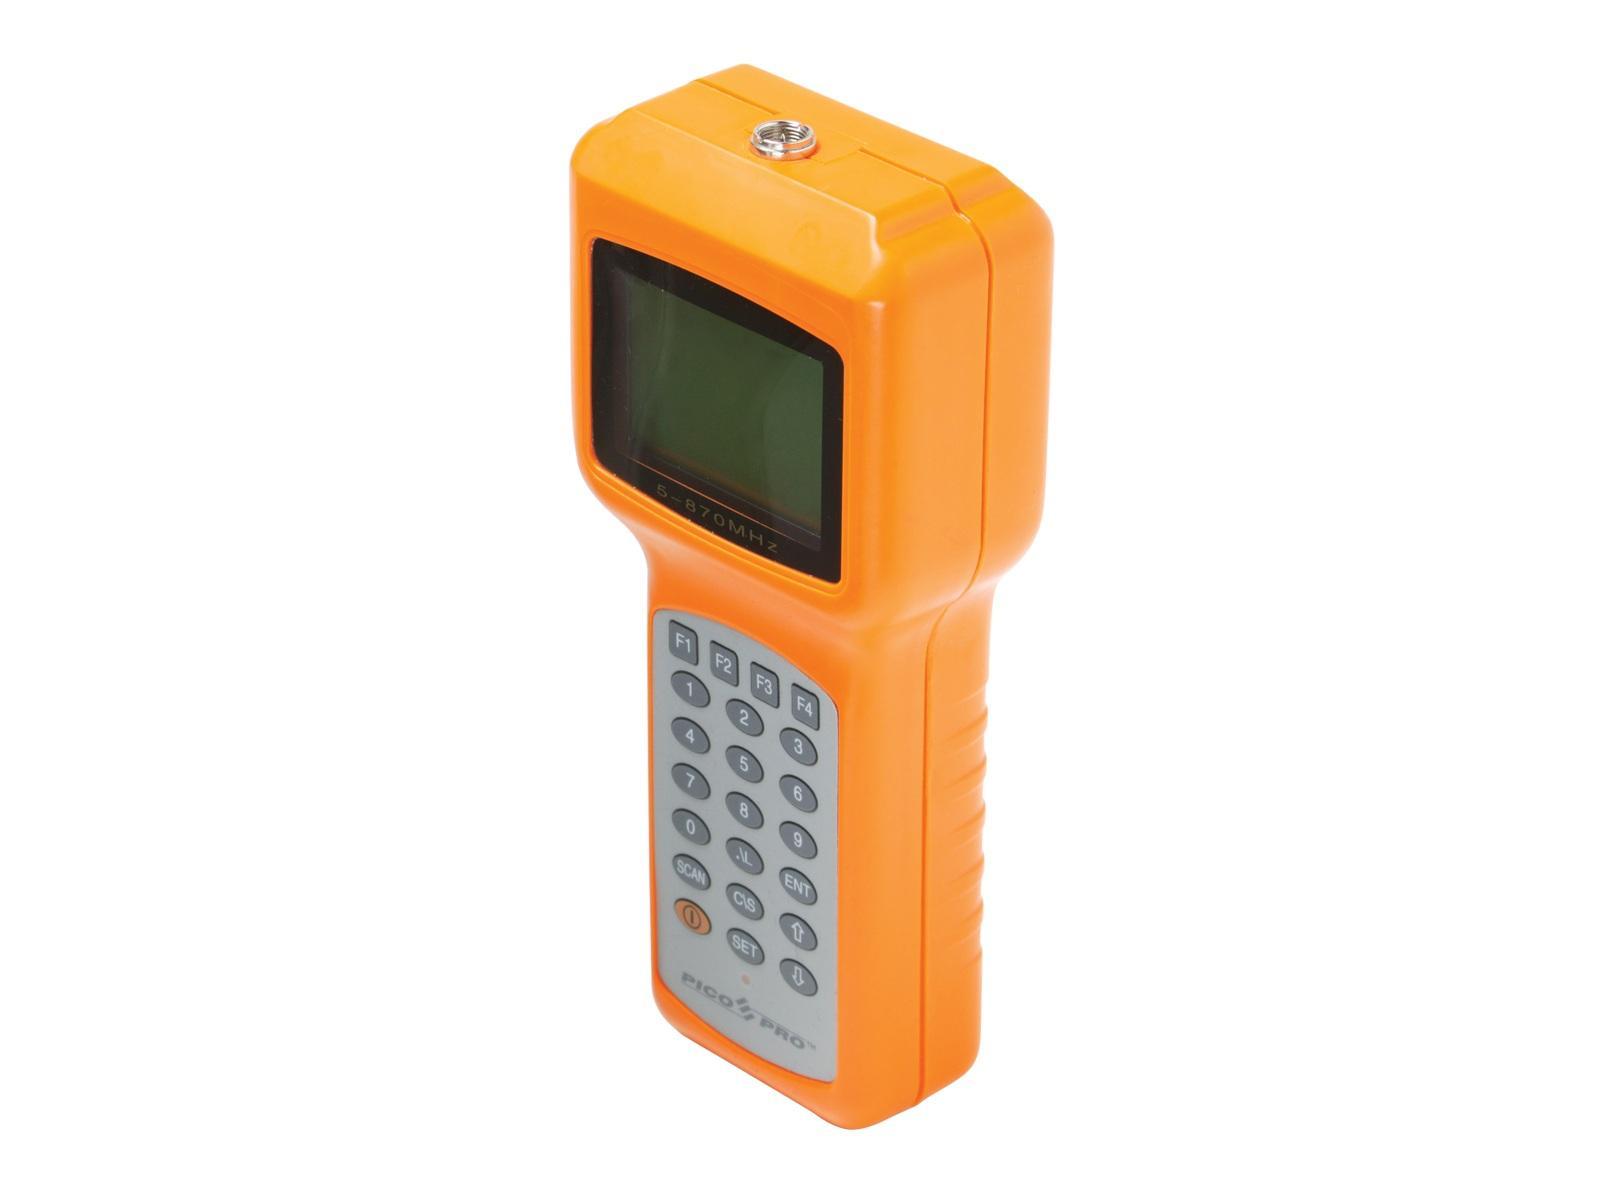 Pico Digital PICO-PRO Signal Analysis Meter with Reverse Pat